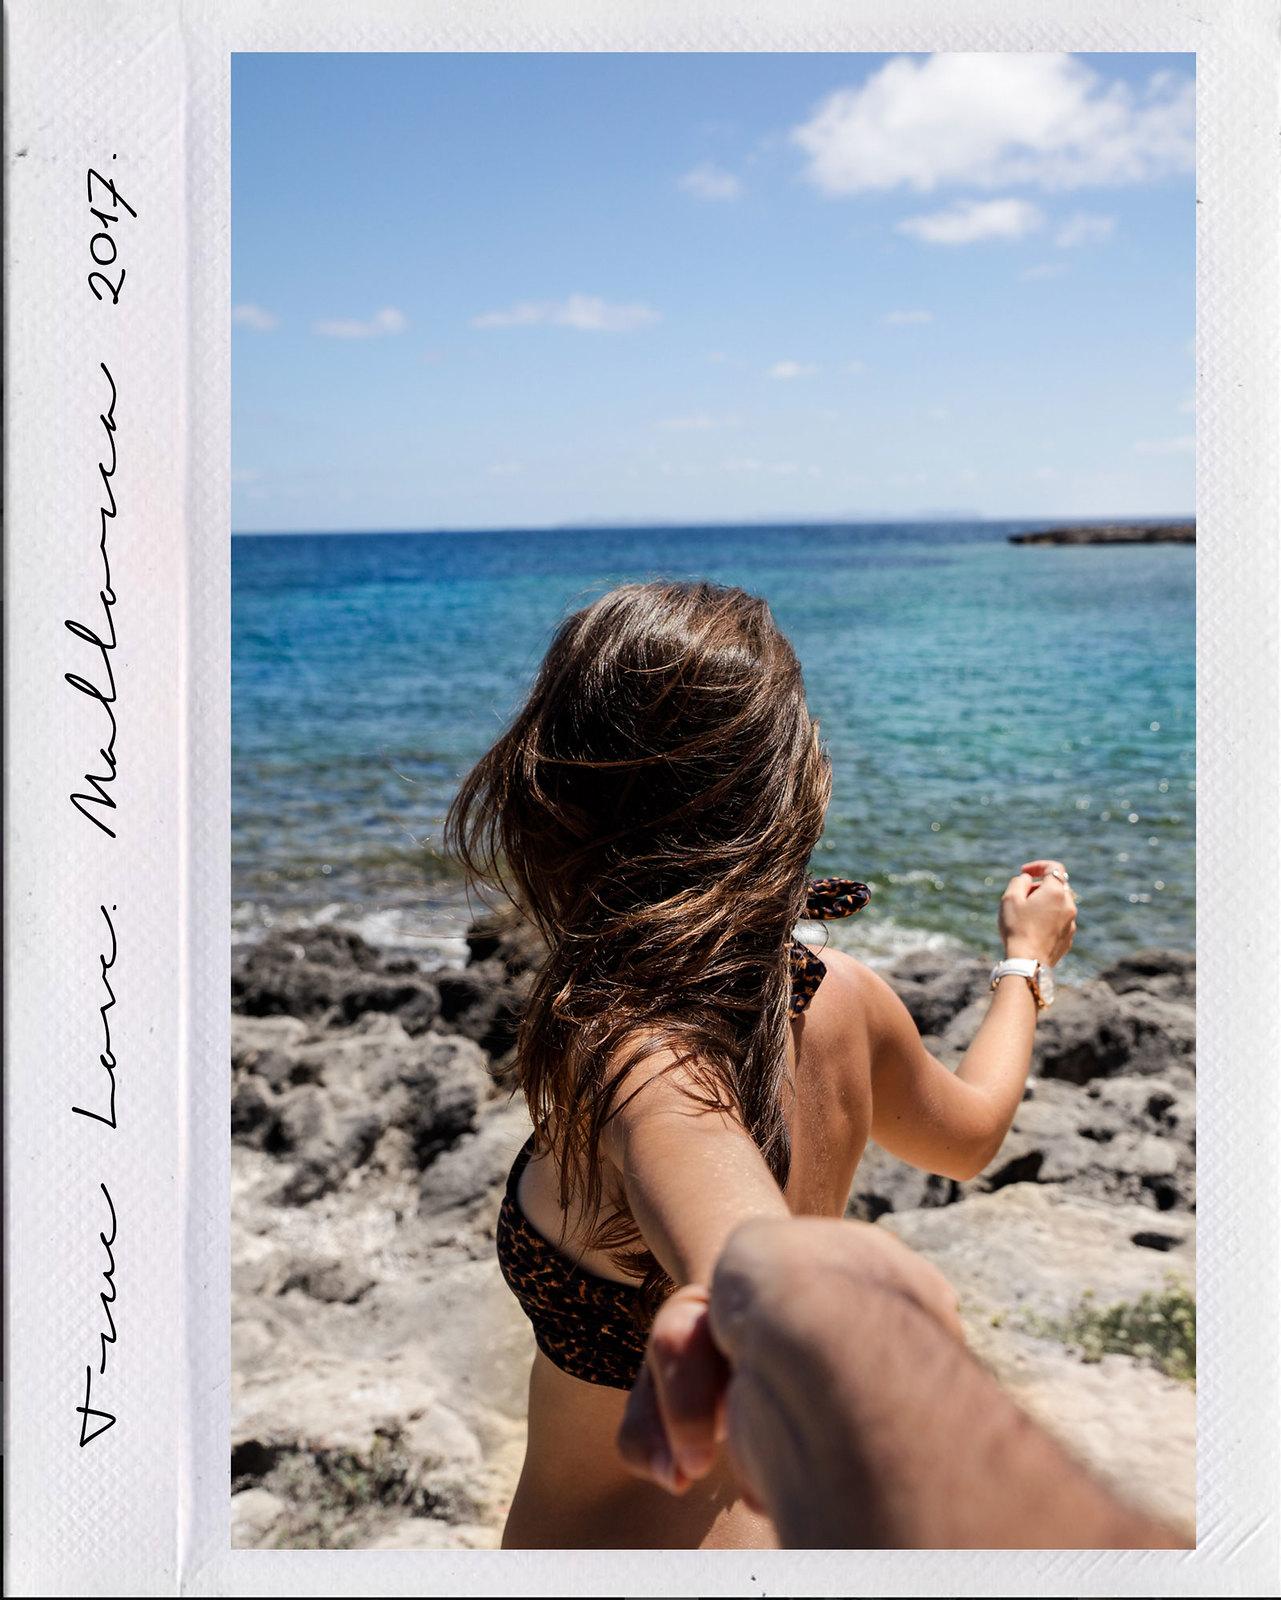 010_beachriot_leopard_swimwear_theguestgirl_summer_the_guest_girl_laura_santolaria_mediterranean_girl_mejor_bañador_2017_bikini_sexy_laura